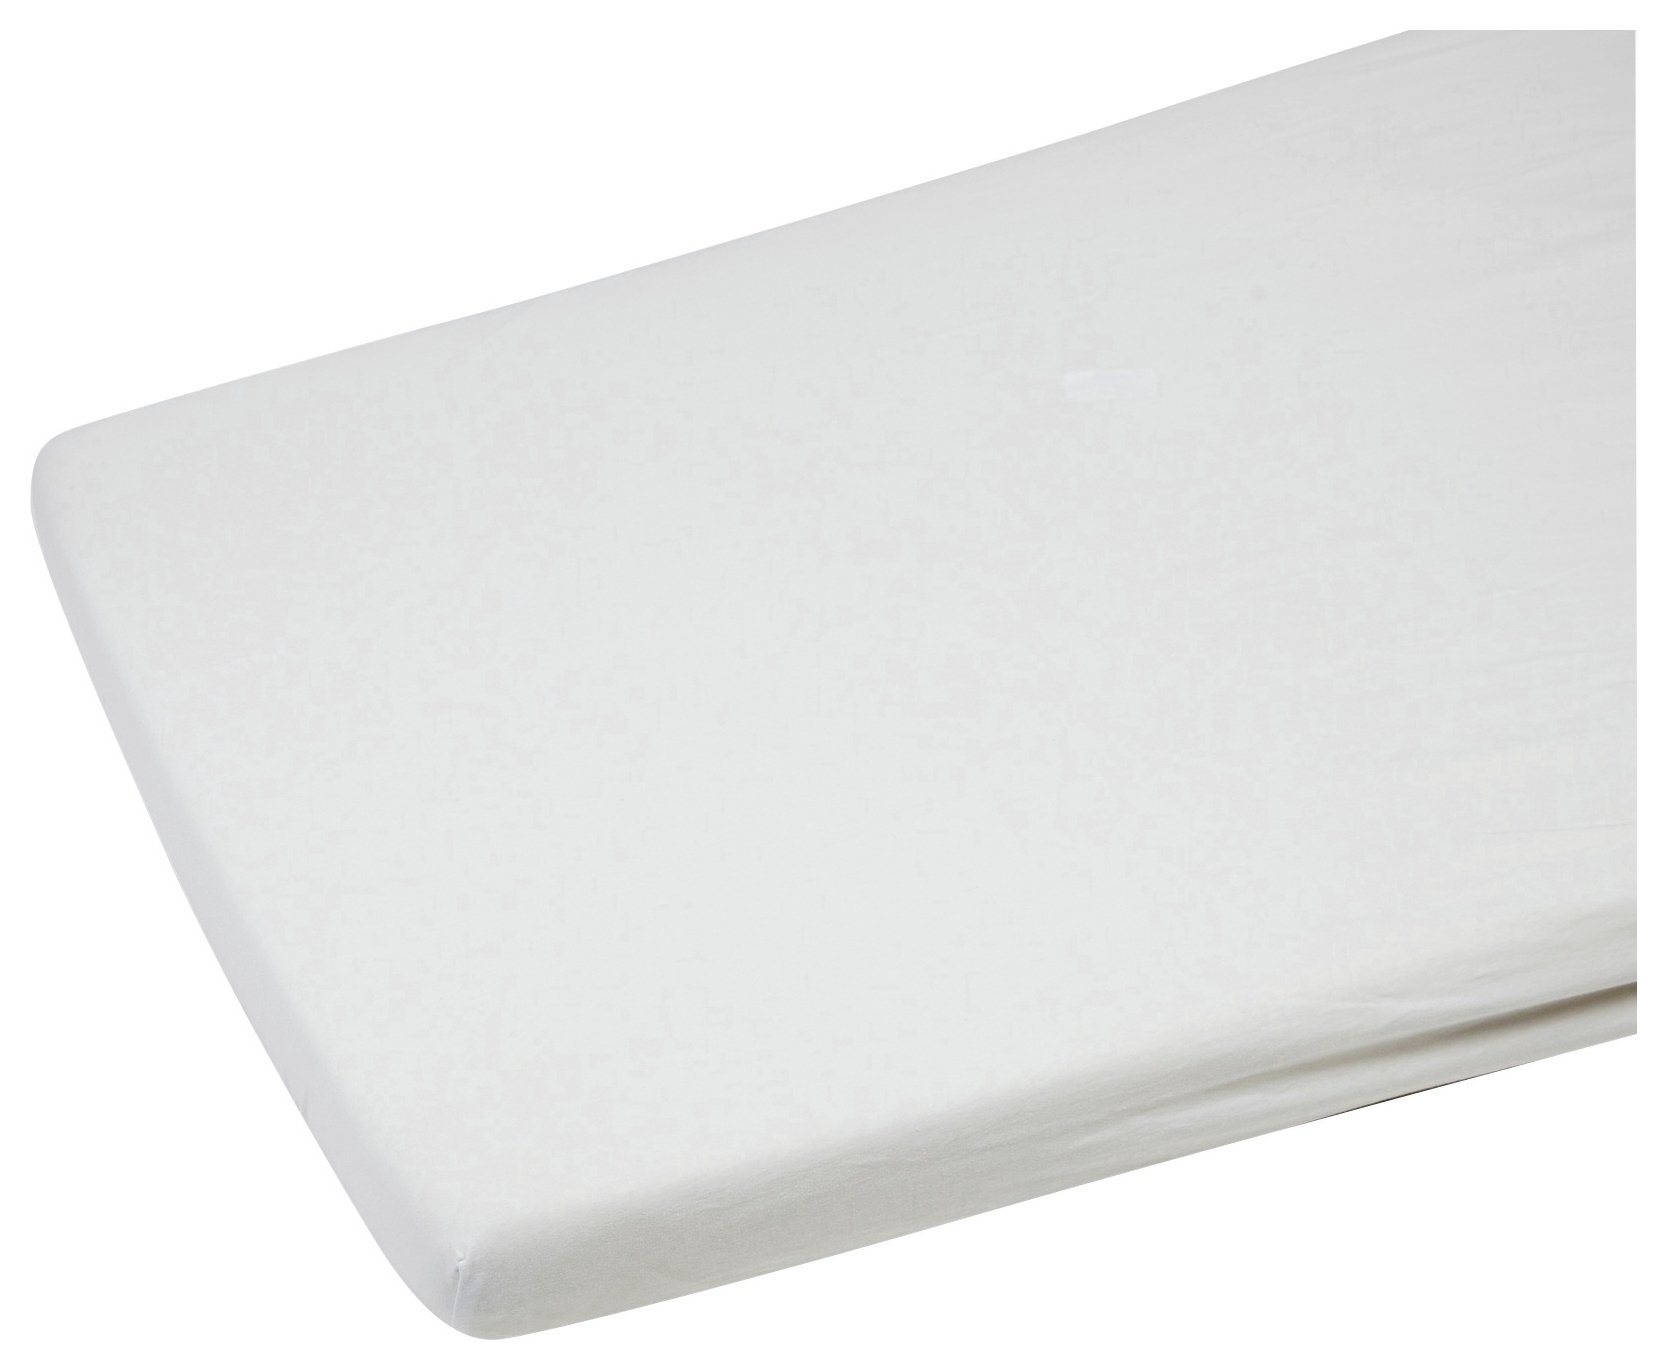 clair de lune  white  cot  bed sheets  2 pack